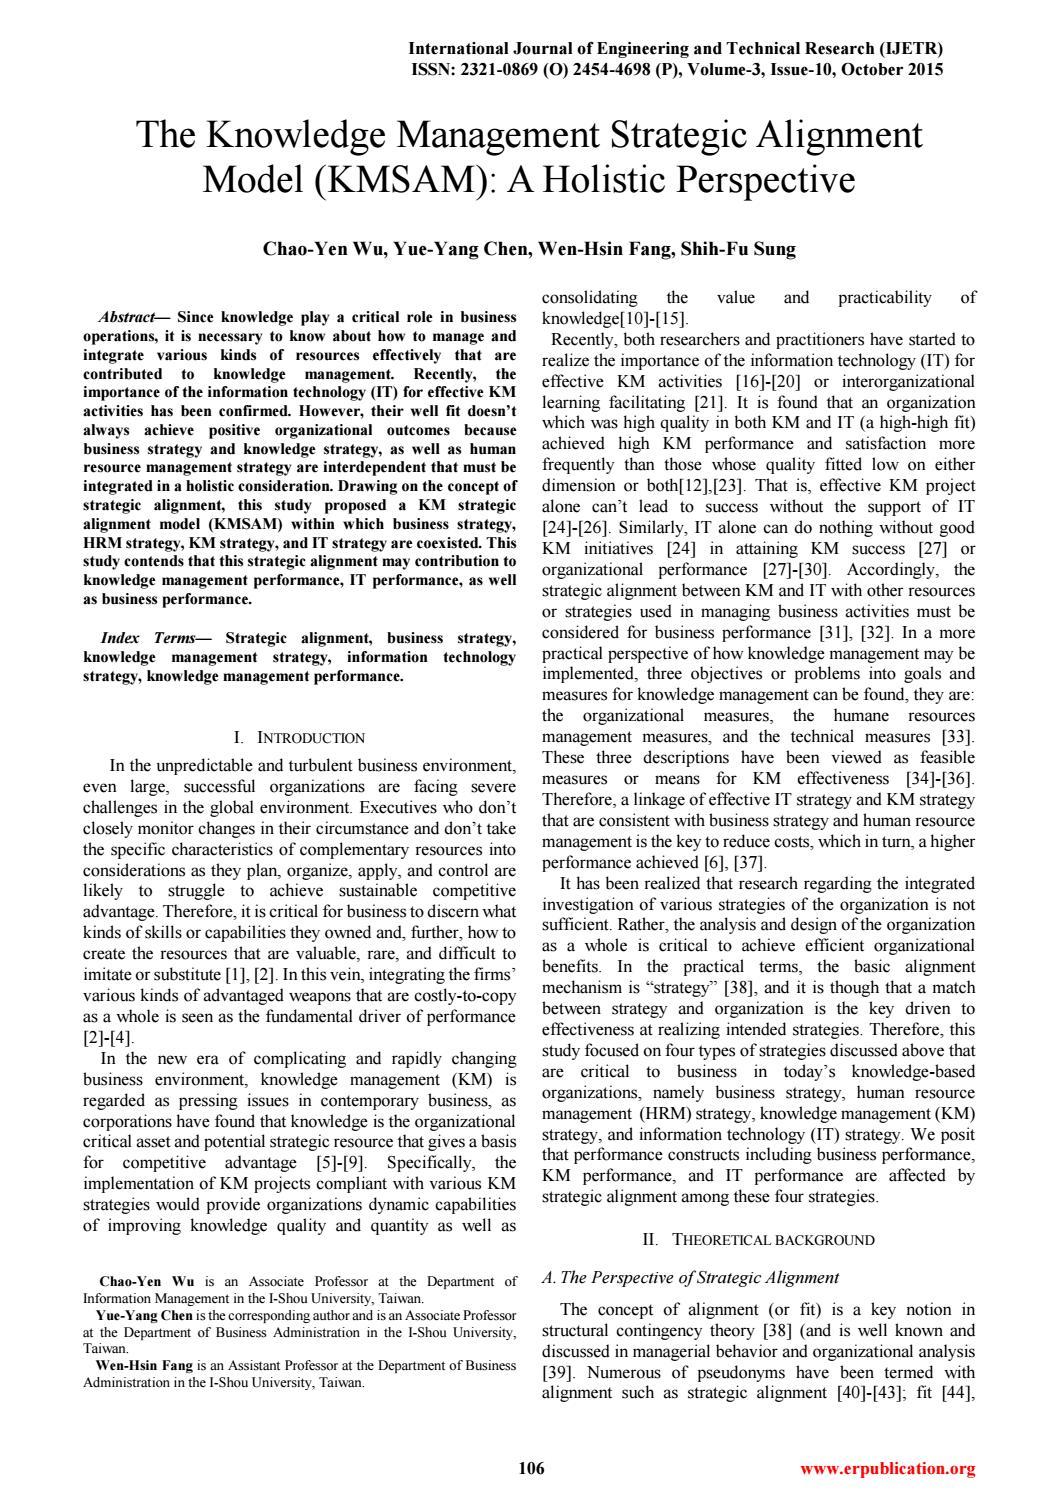 Ijetr033251 by International Journal of Engineering